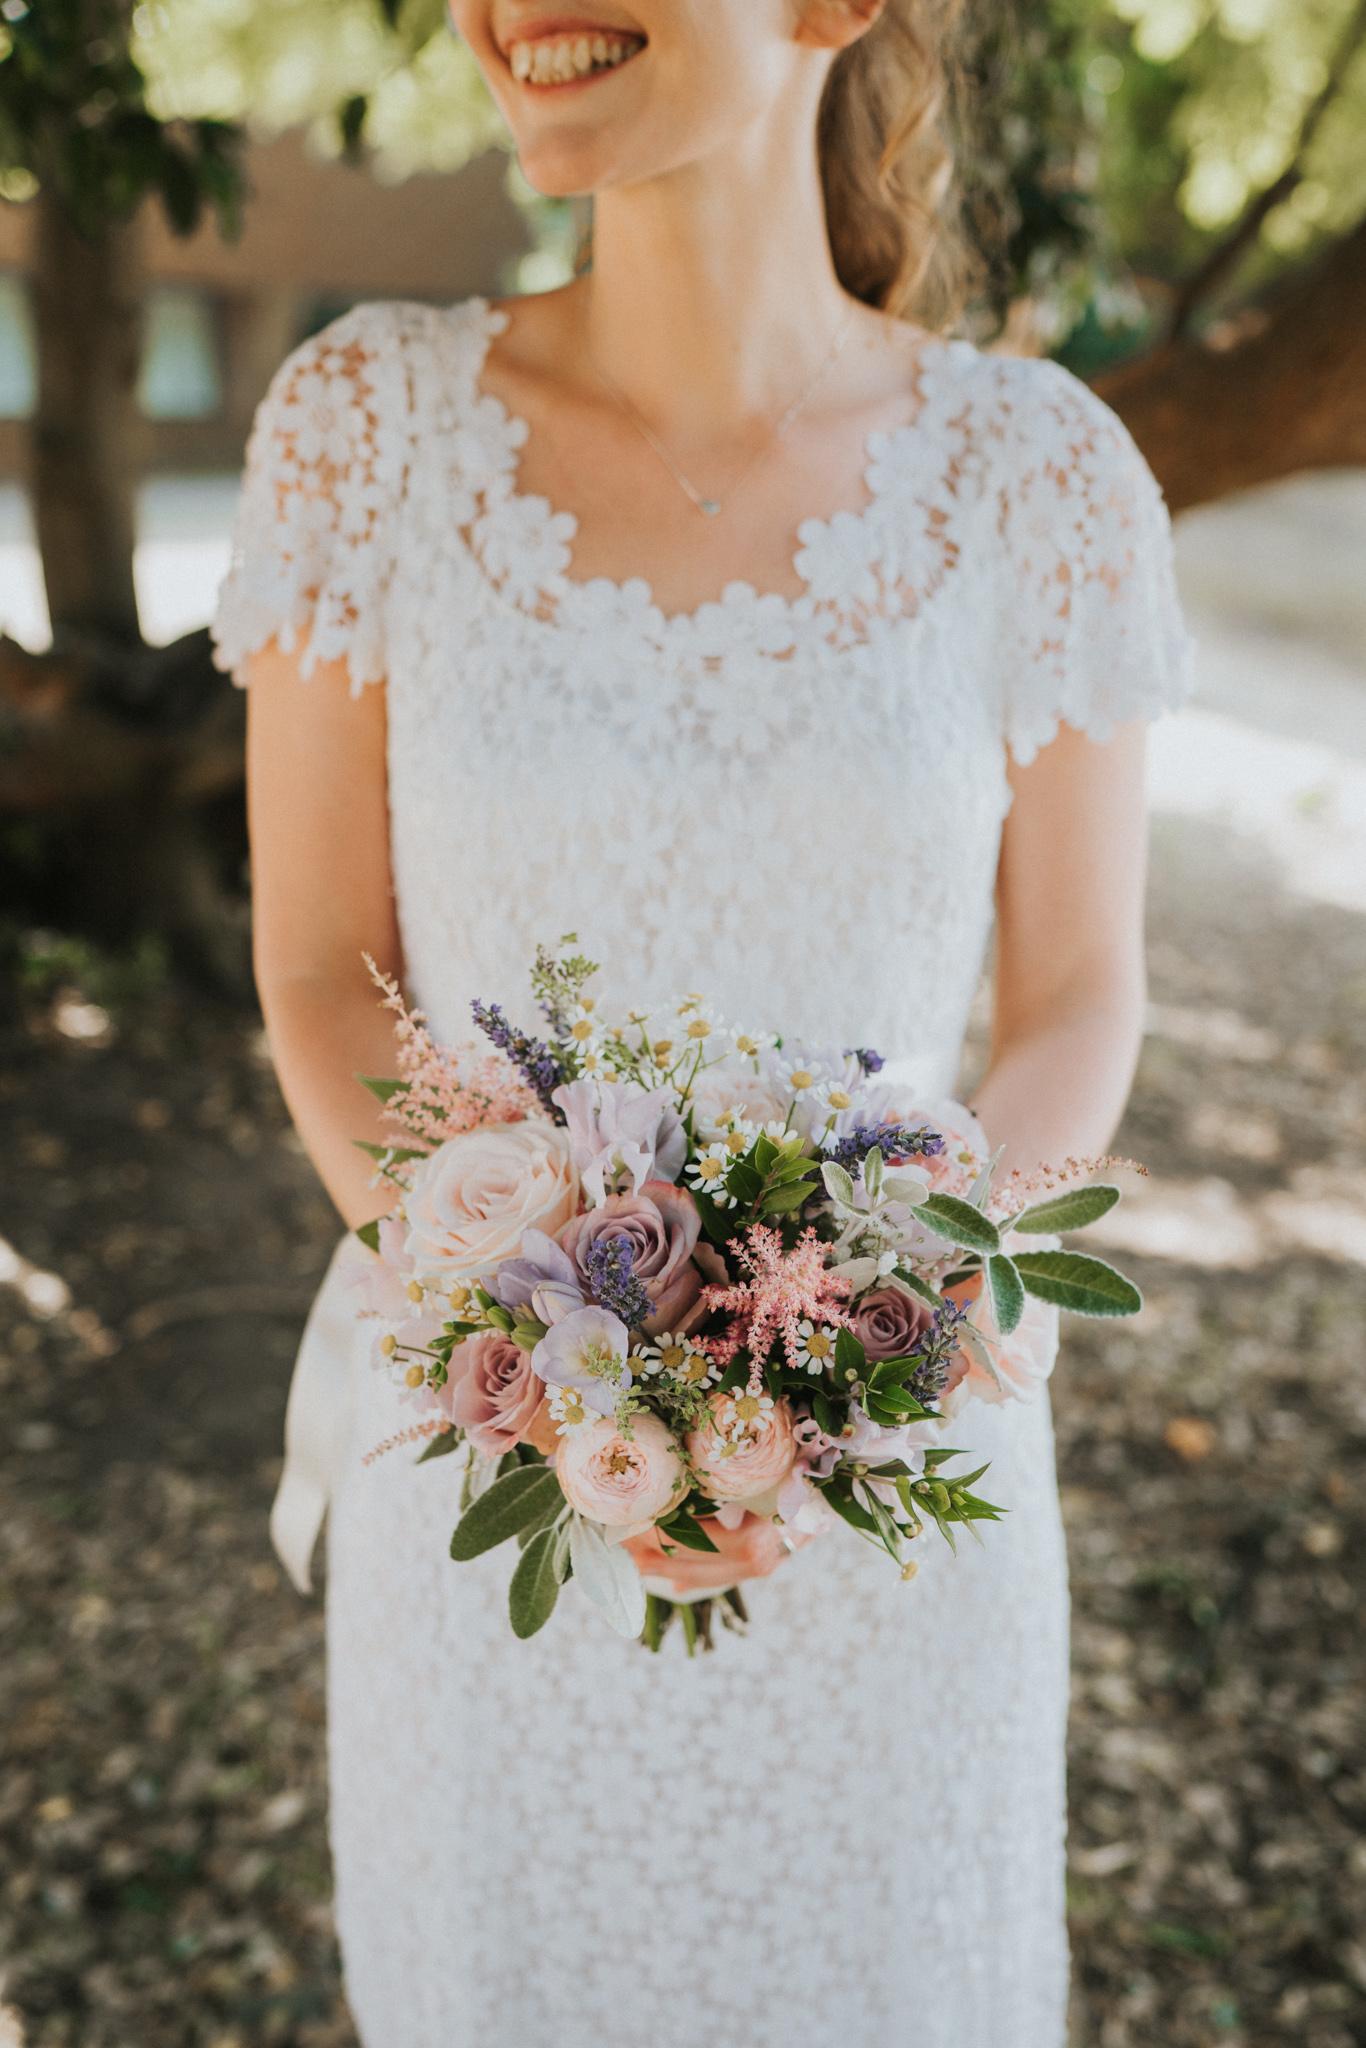 Grace-Elizabeth-Georgie-Amalaketu-Firstsite-Colchester-Essex-Boho-Buddhist-Wedding-Alternative-Wedding-Photography-Essex (92 of 100).jpg